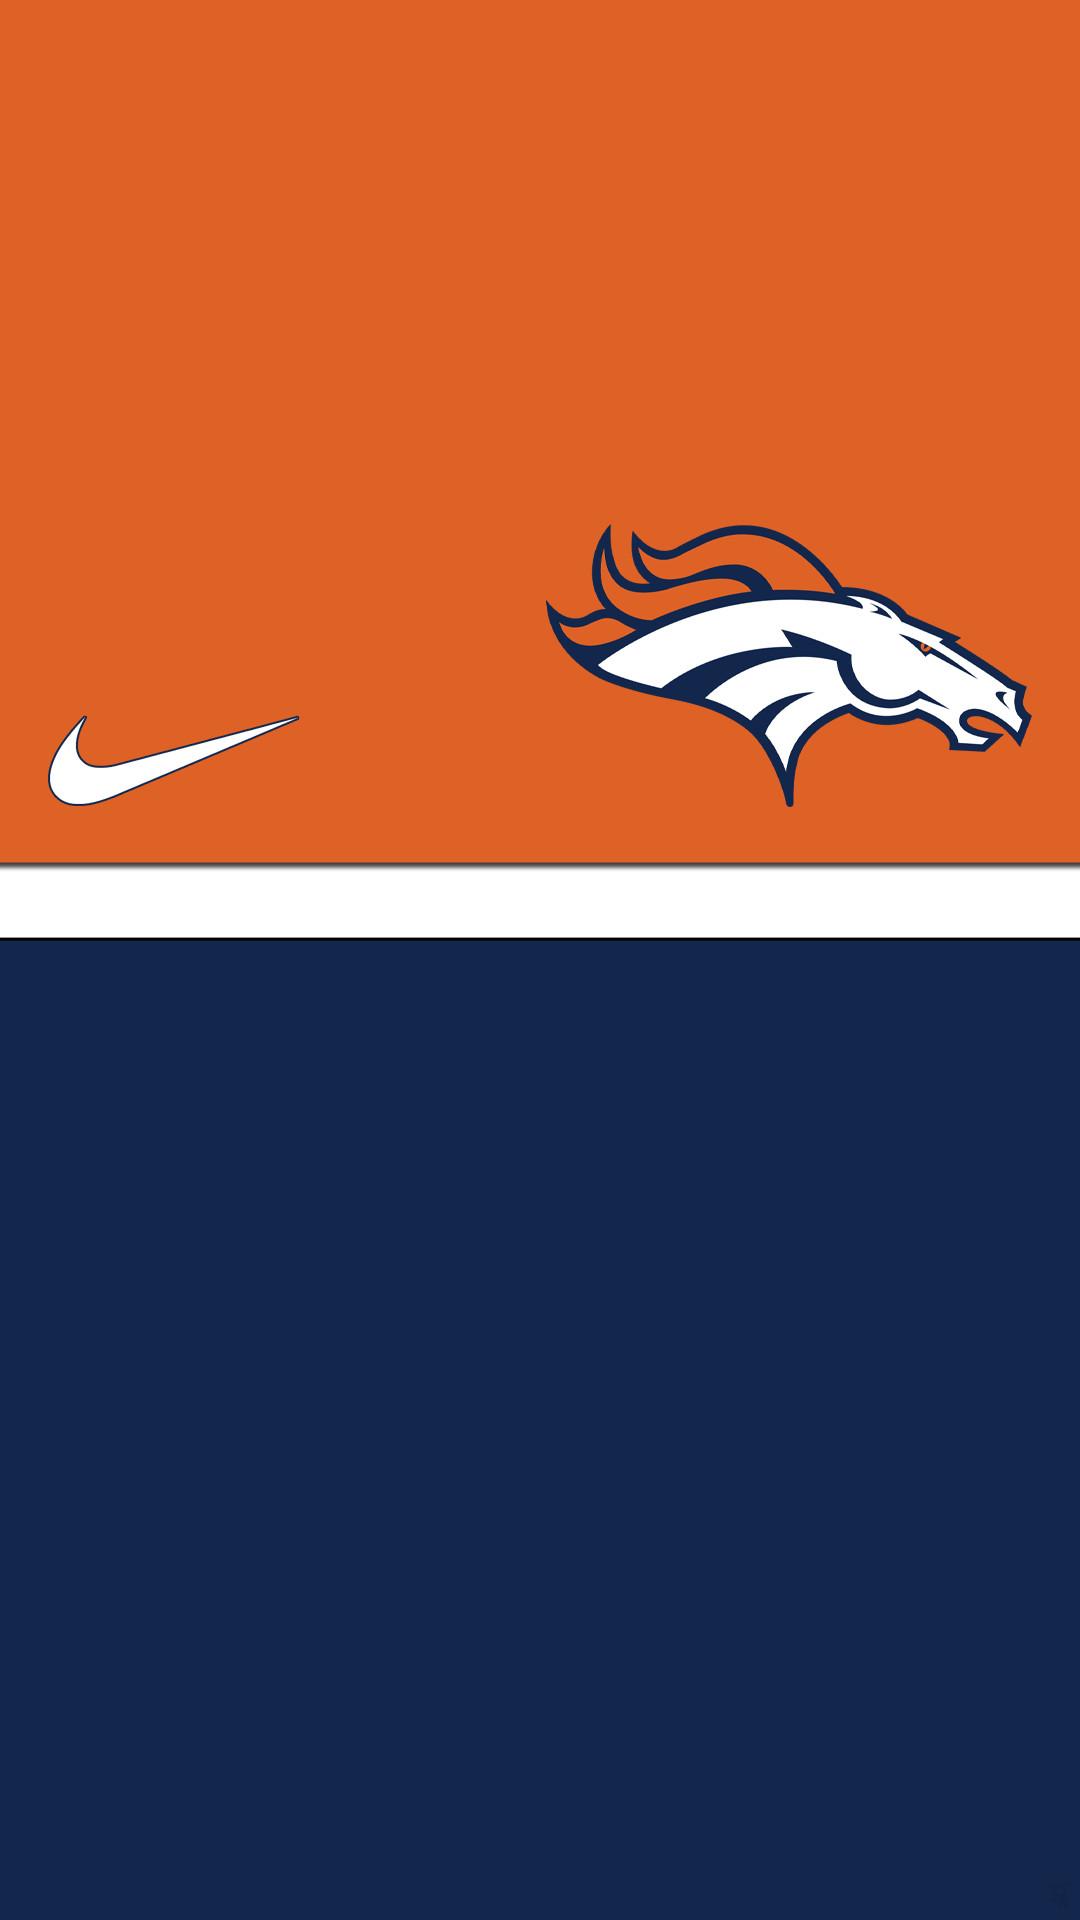 Denver Broncos Backgrounds – Wallpaper Cave   All Wallpapers   Pinterest    Wallpaper